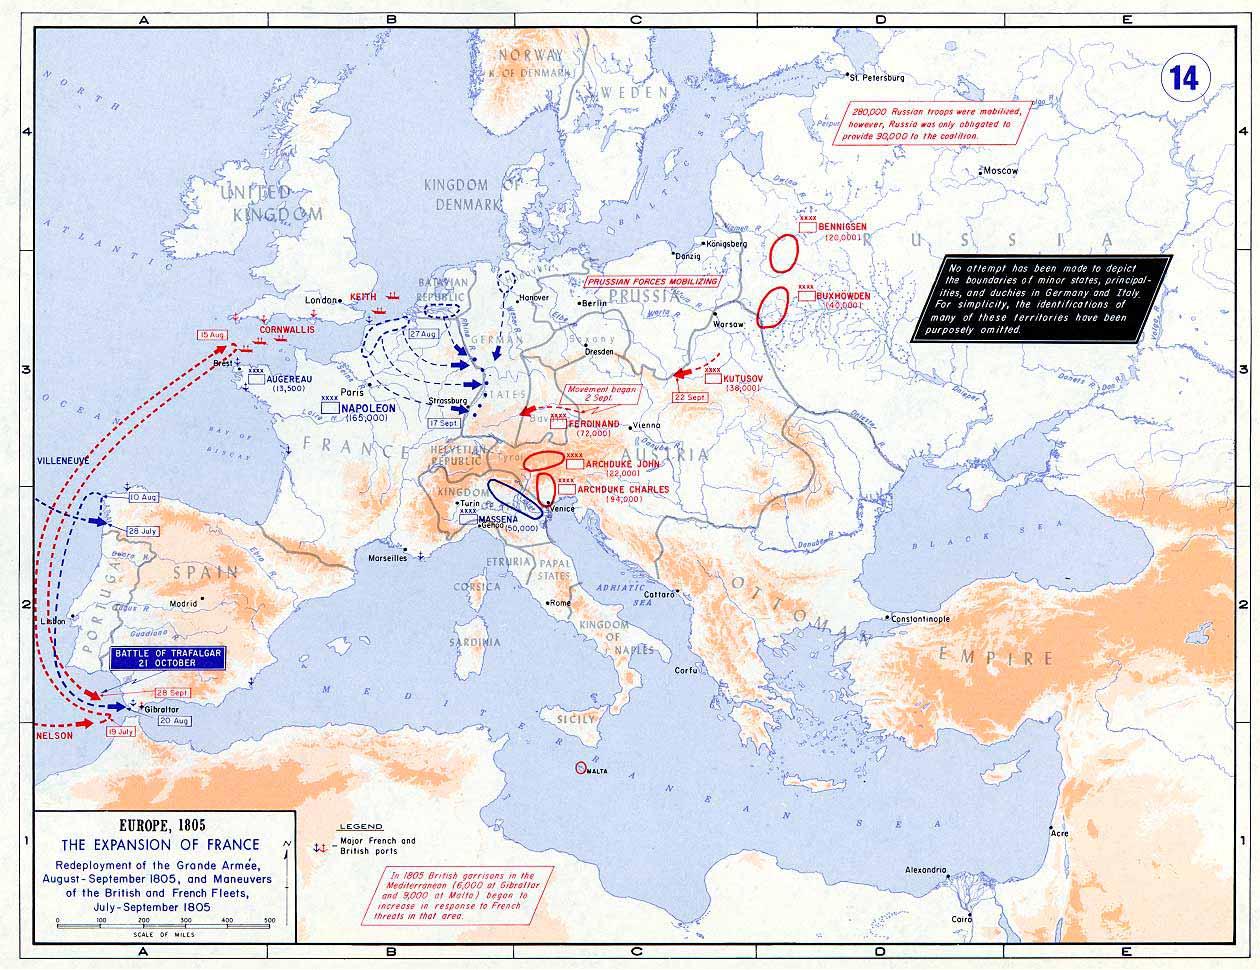 Batalla De Trafalgar Mapa.Por Que Se Perdio La Batalla De Trafalgar Todo A Babor